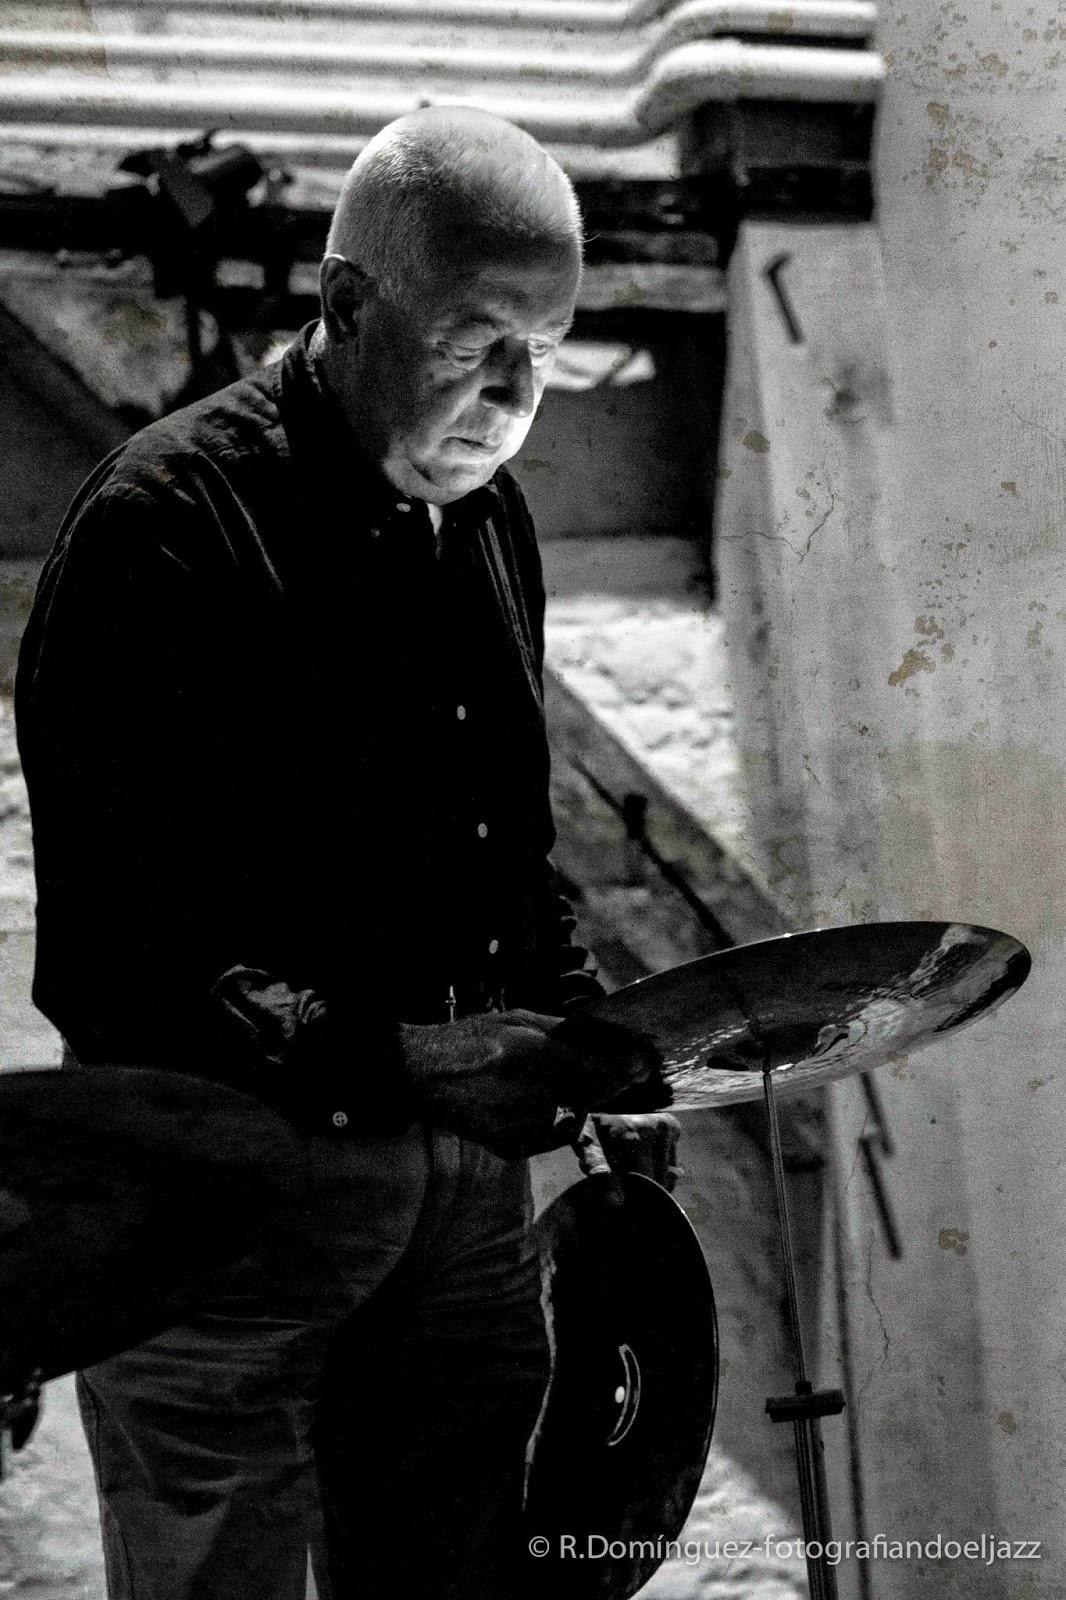 © R.Domínguez - Han Bennink & Jaak Sooäär